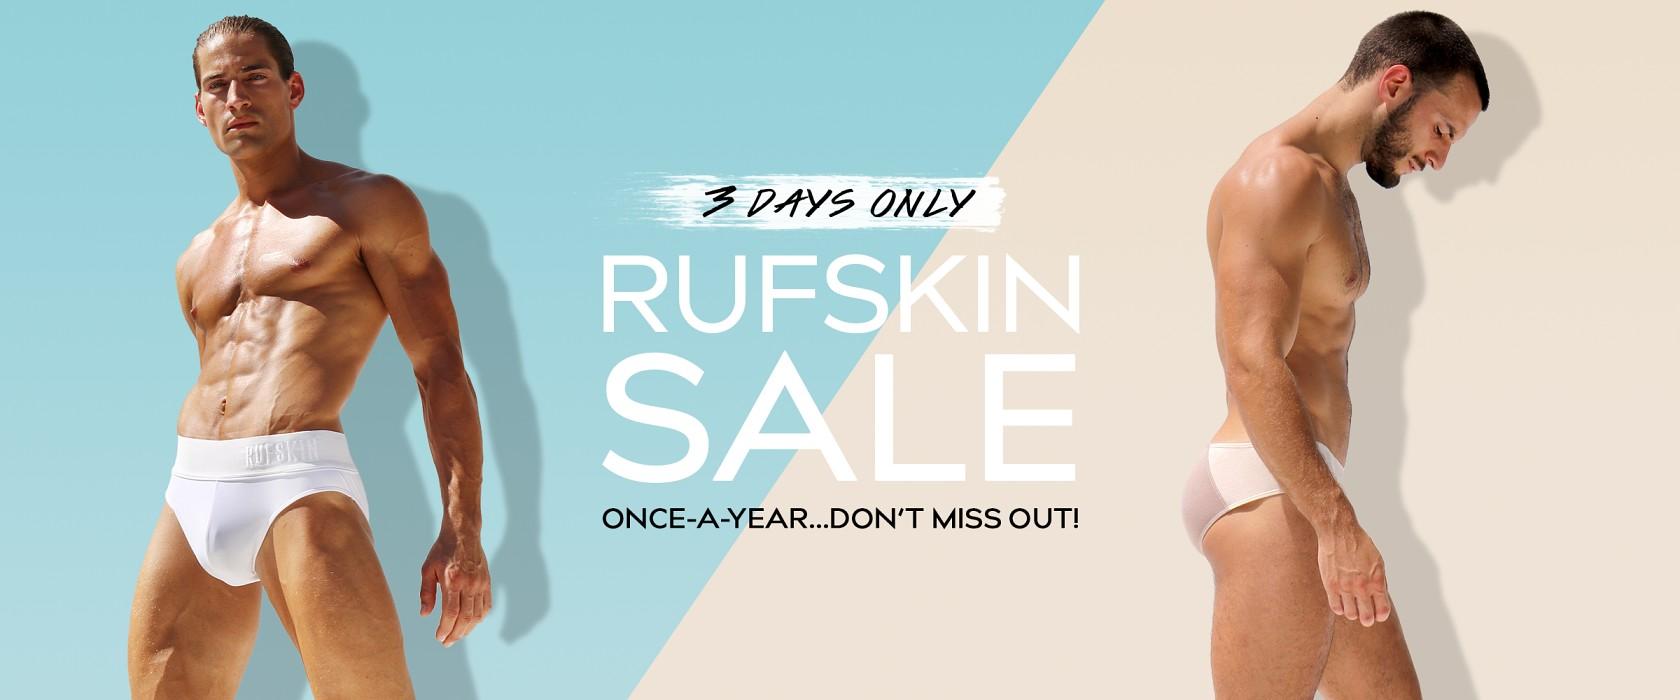 rufskin-sale-at-international-jock